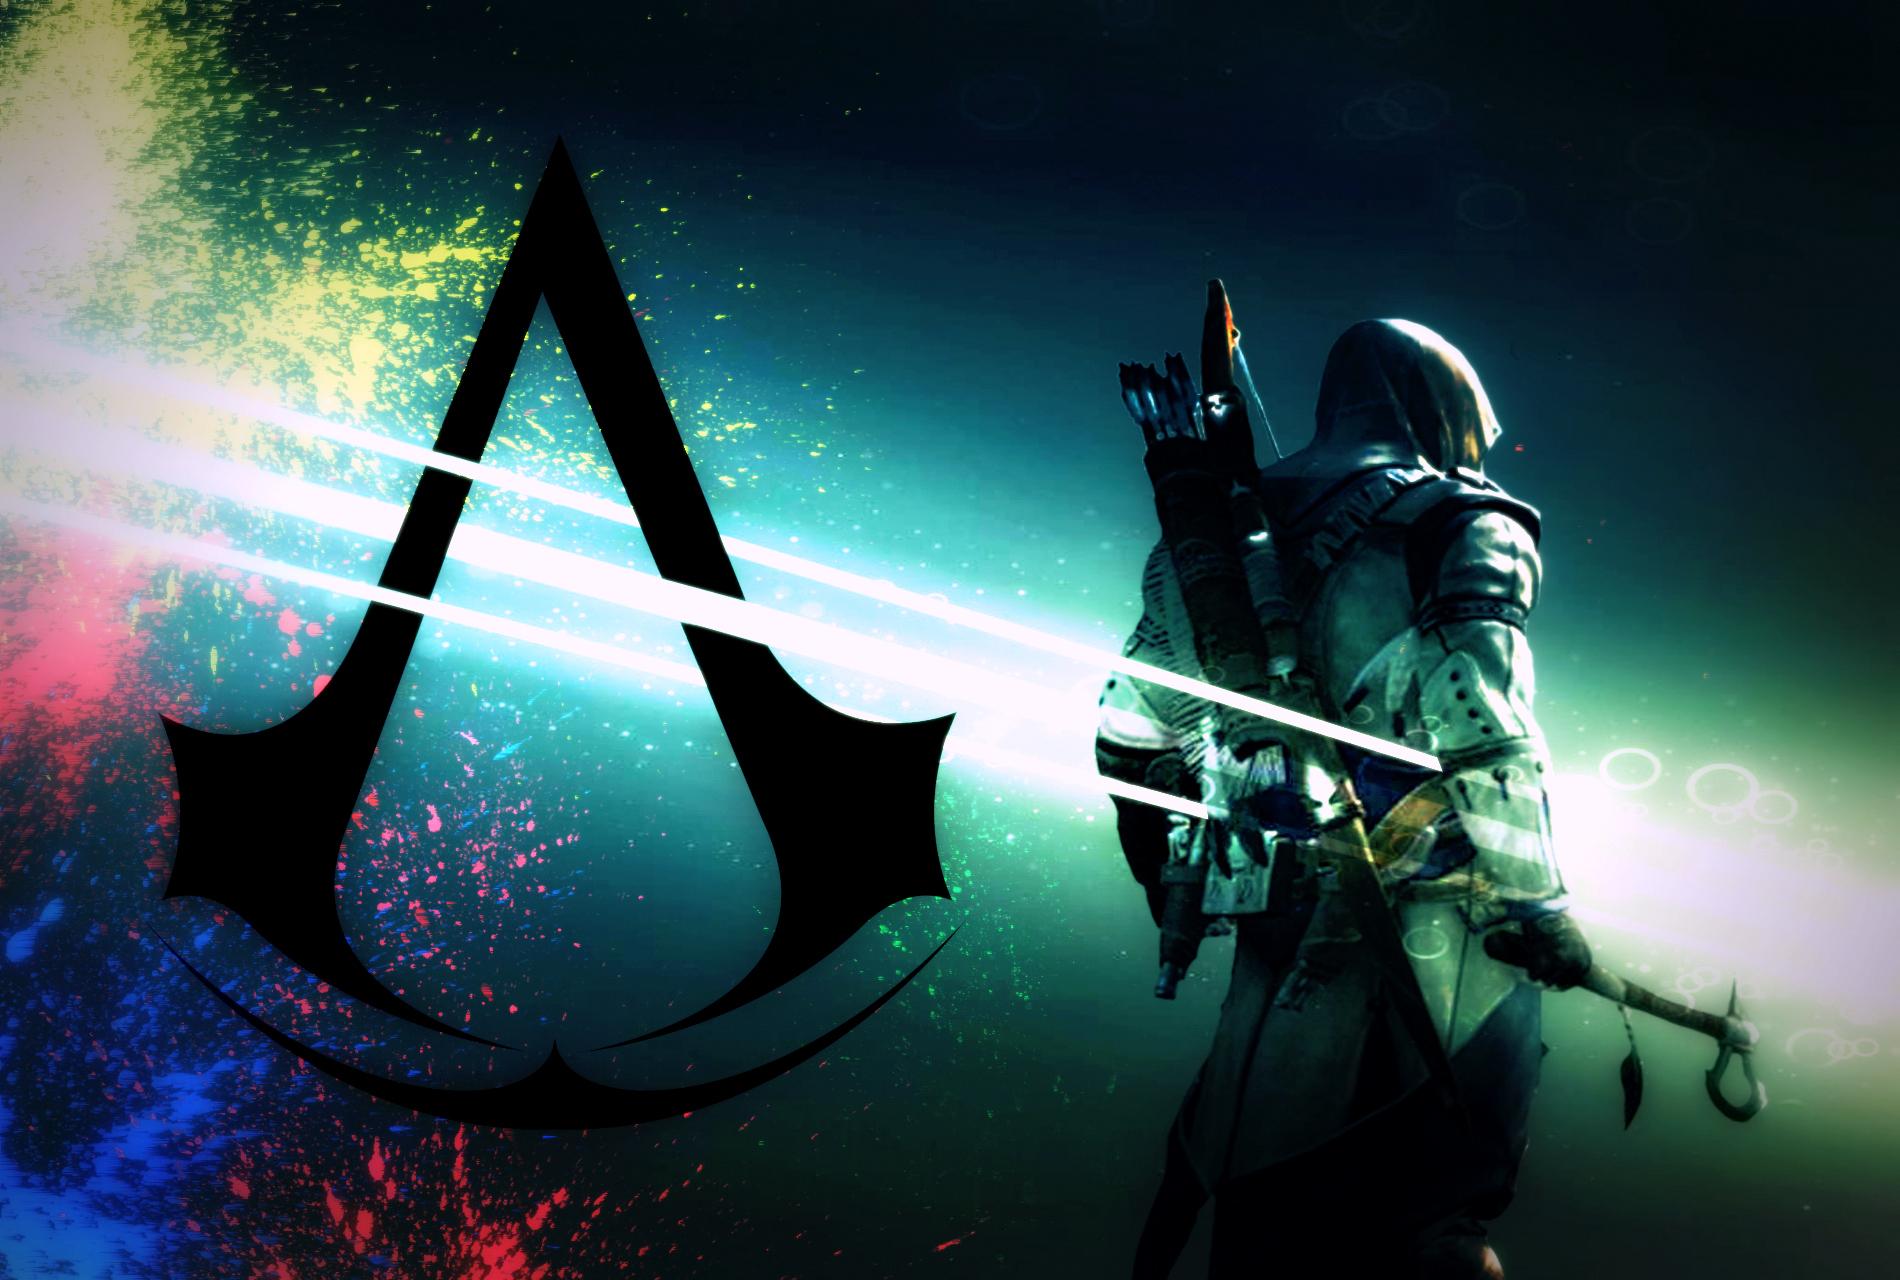 <b>Assassins Creed 3 Wallpaper</b> 1600x900 Image Gallery - DirDoo